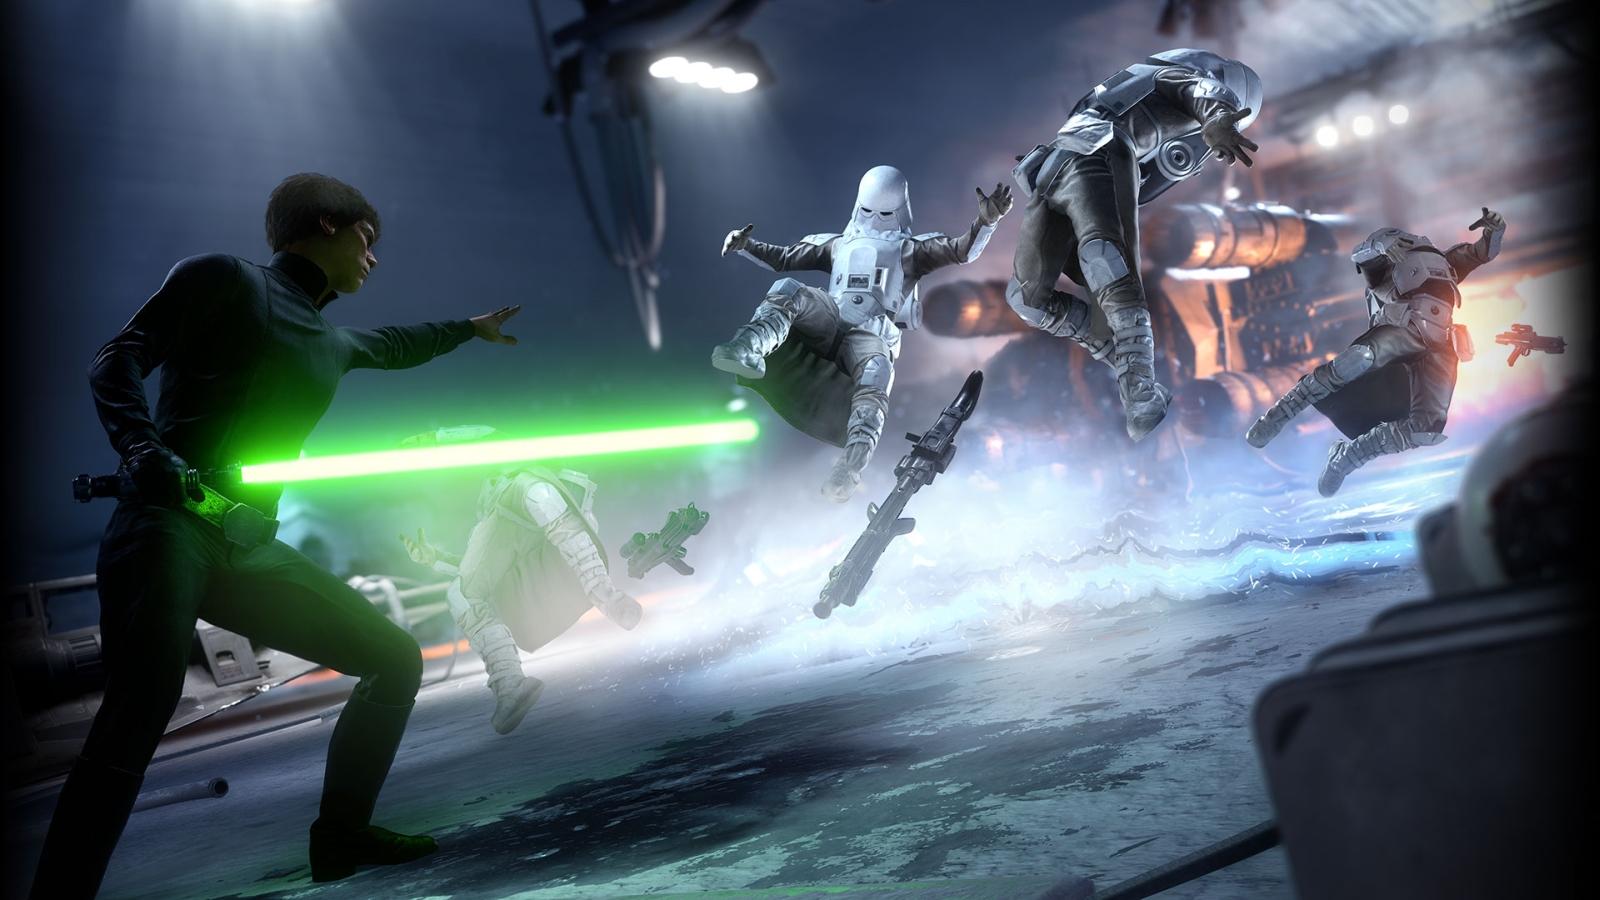 Star Wars Battlefront render